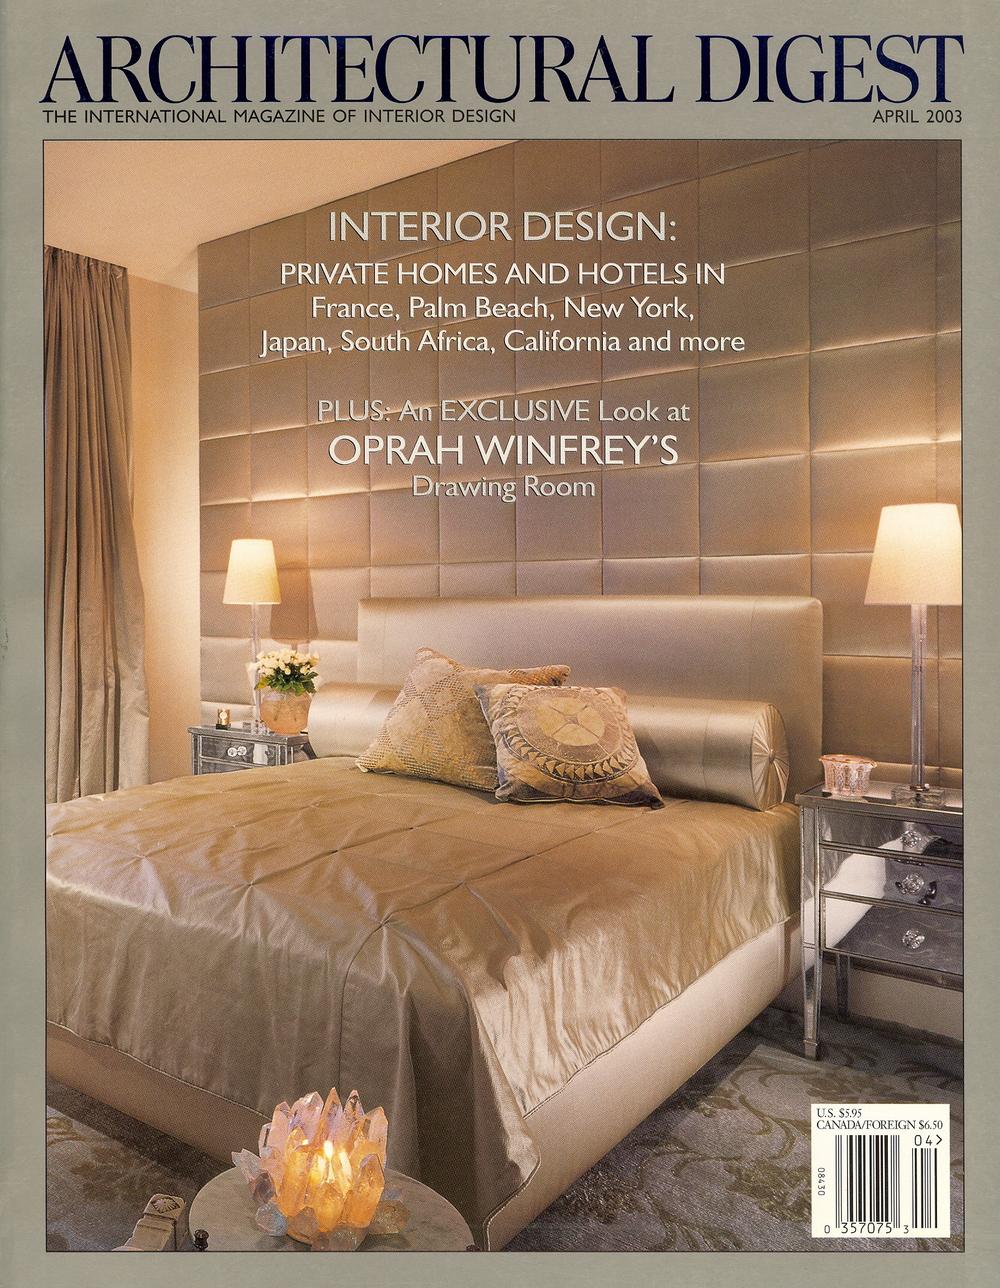 Lorton Architectural Digest Cover 2003.jpg